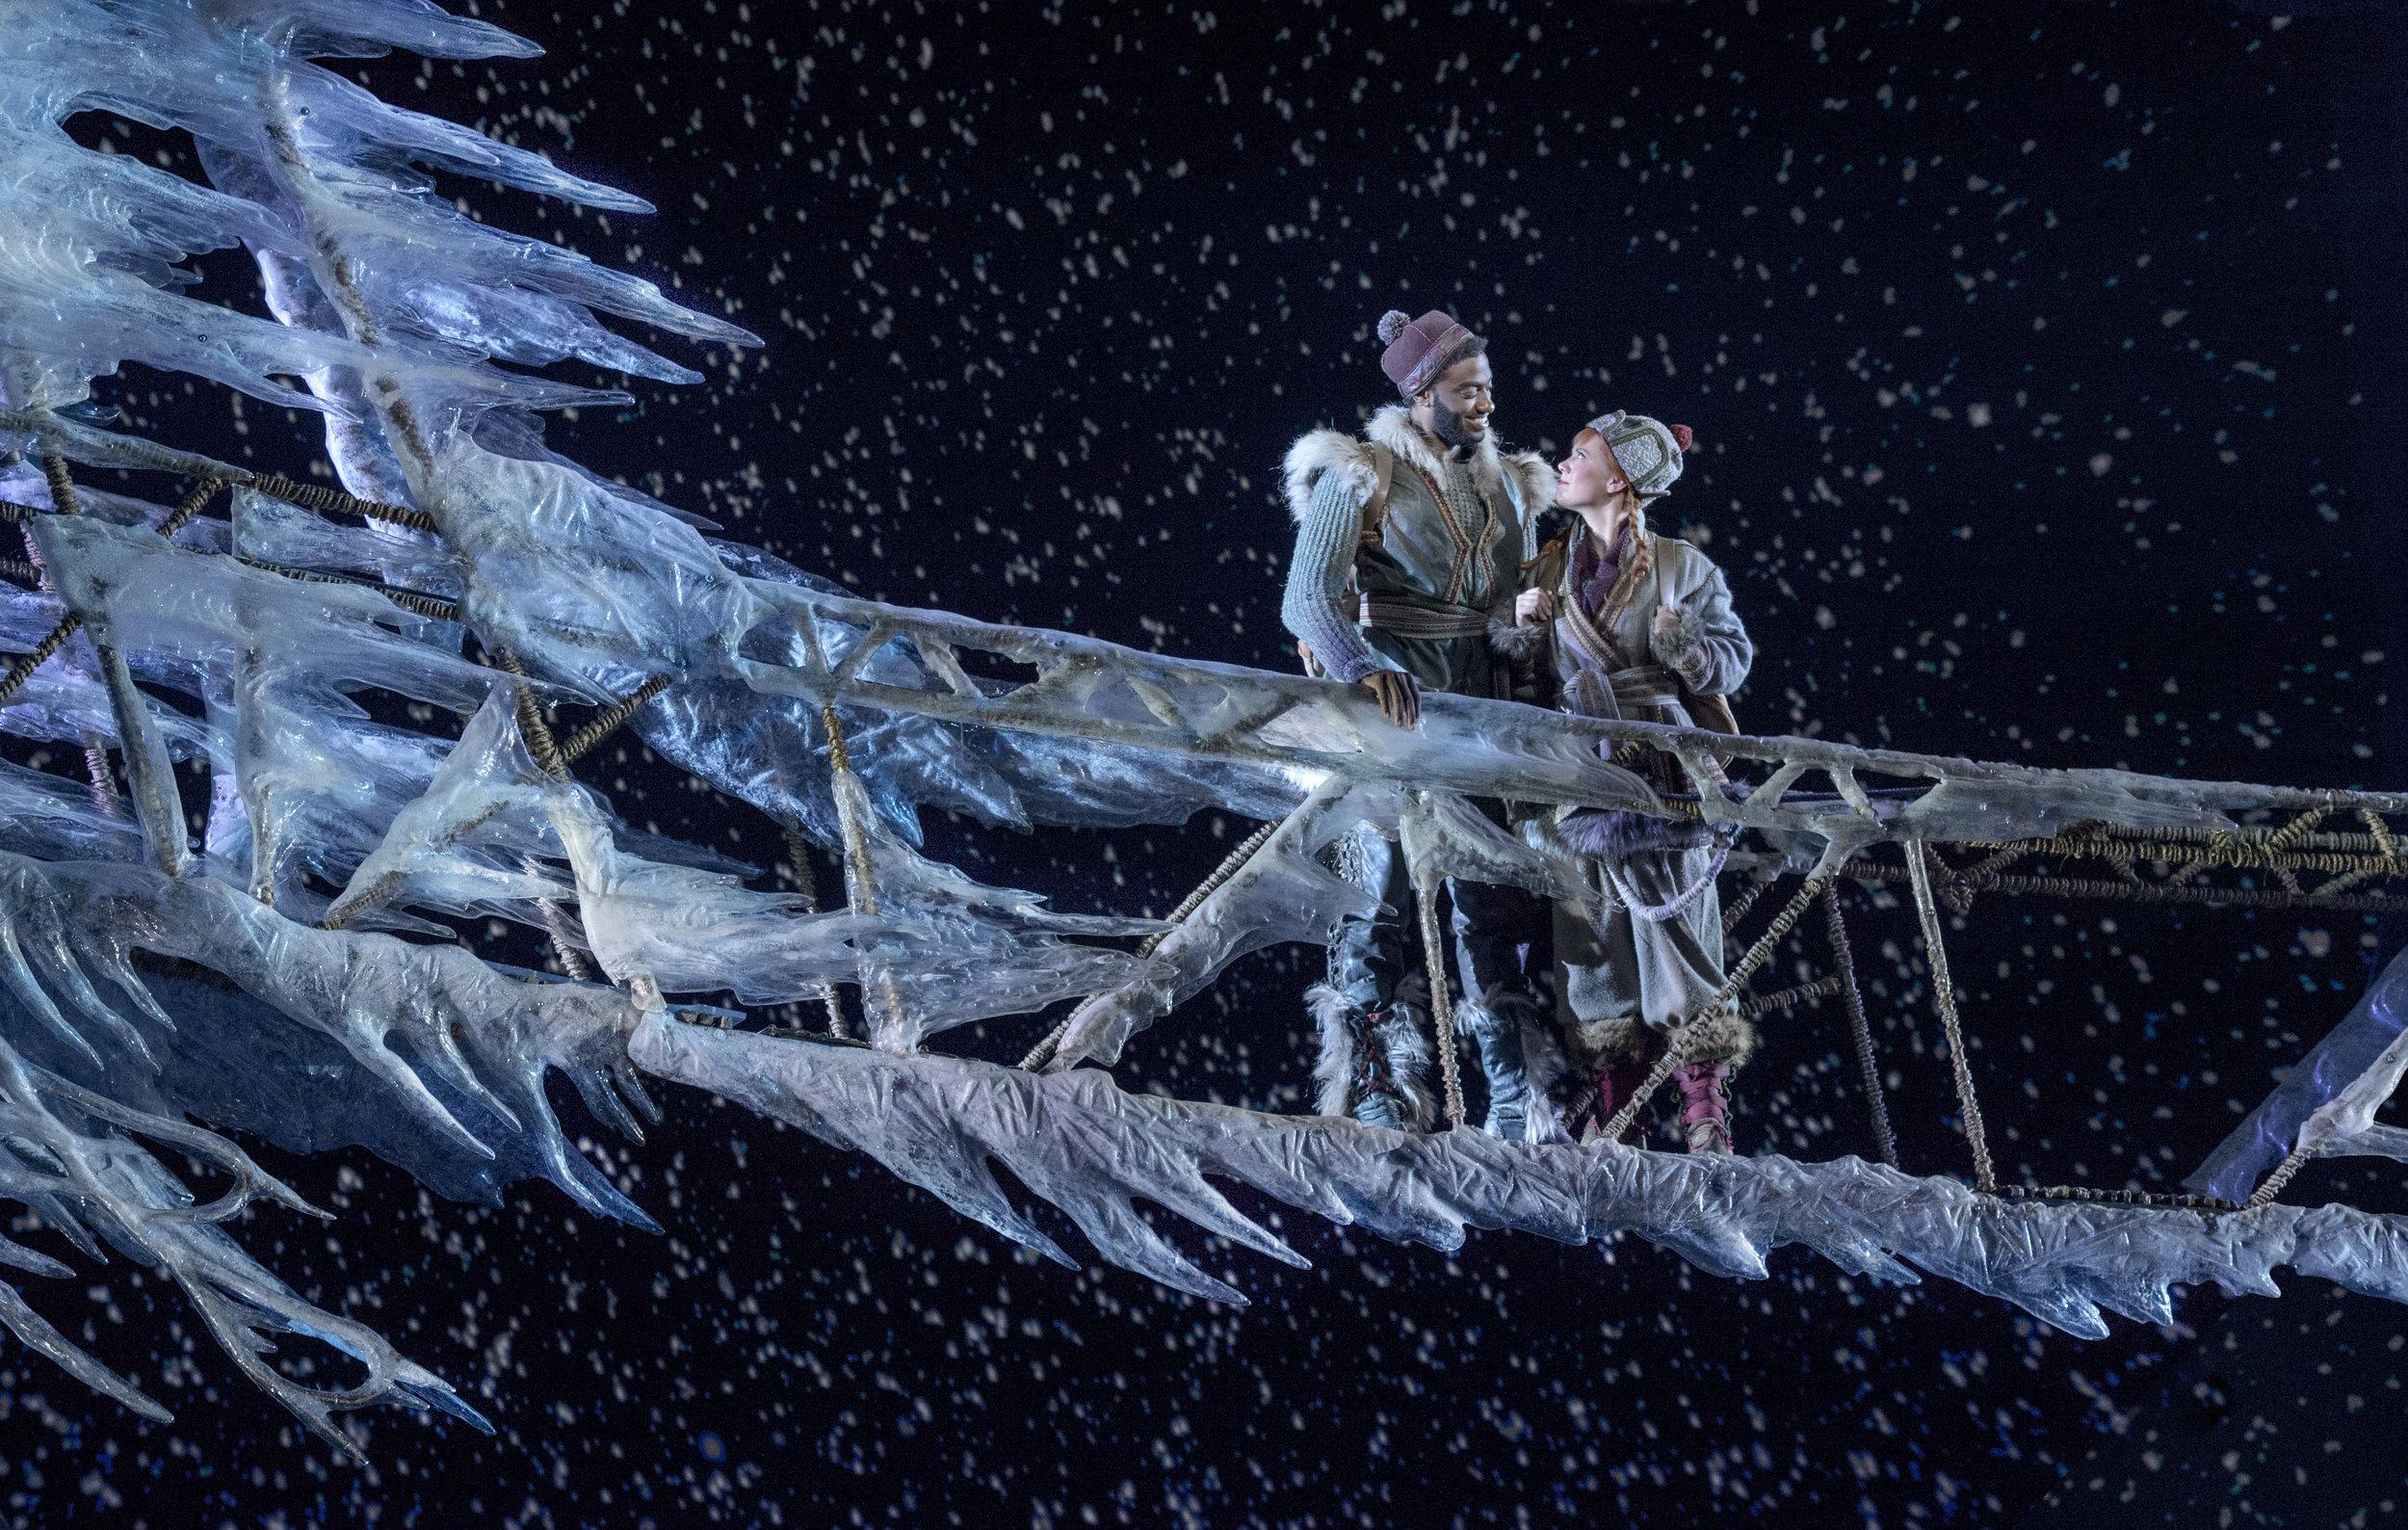 Jelani Alladin (Kristoff) and Patti Murin (Anna) in FROZEN on Broadway. Photo by Deen van Meer.jpg